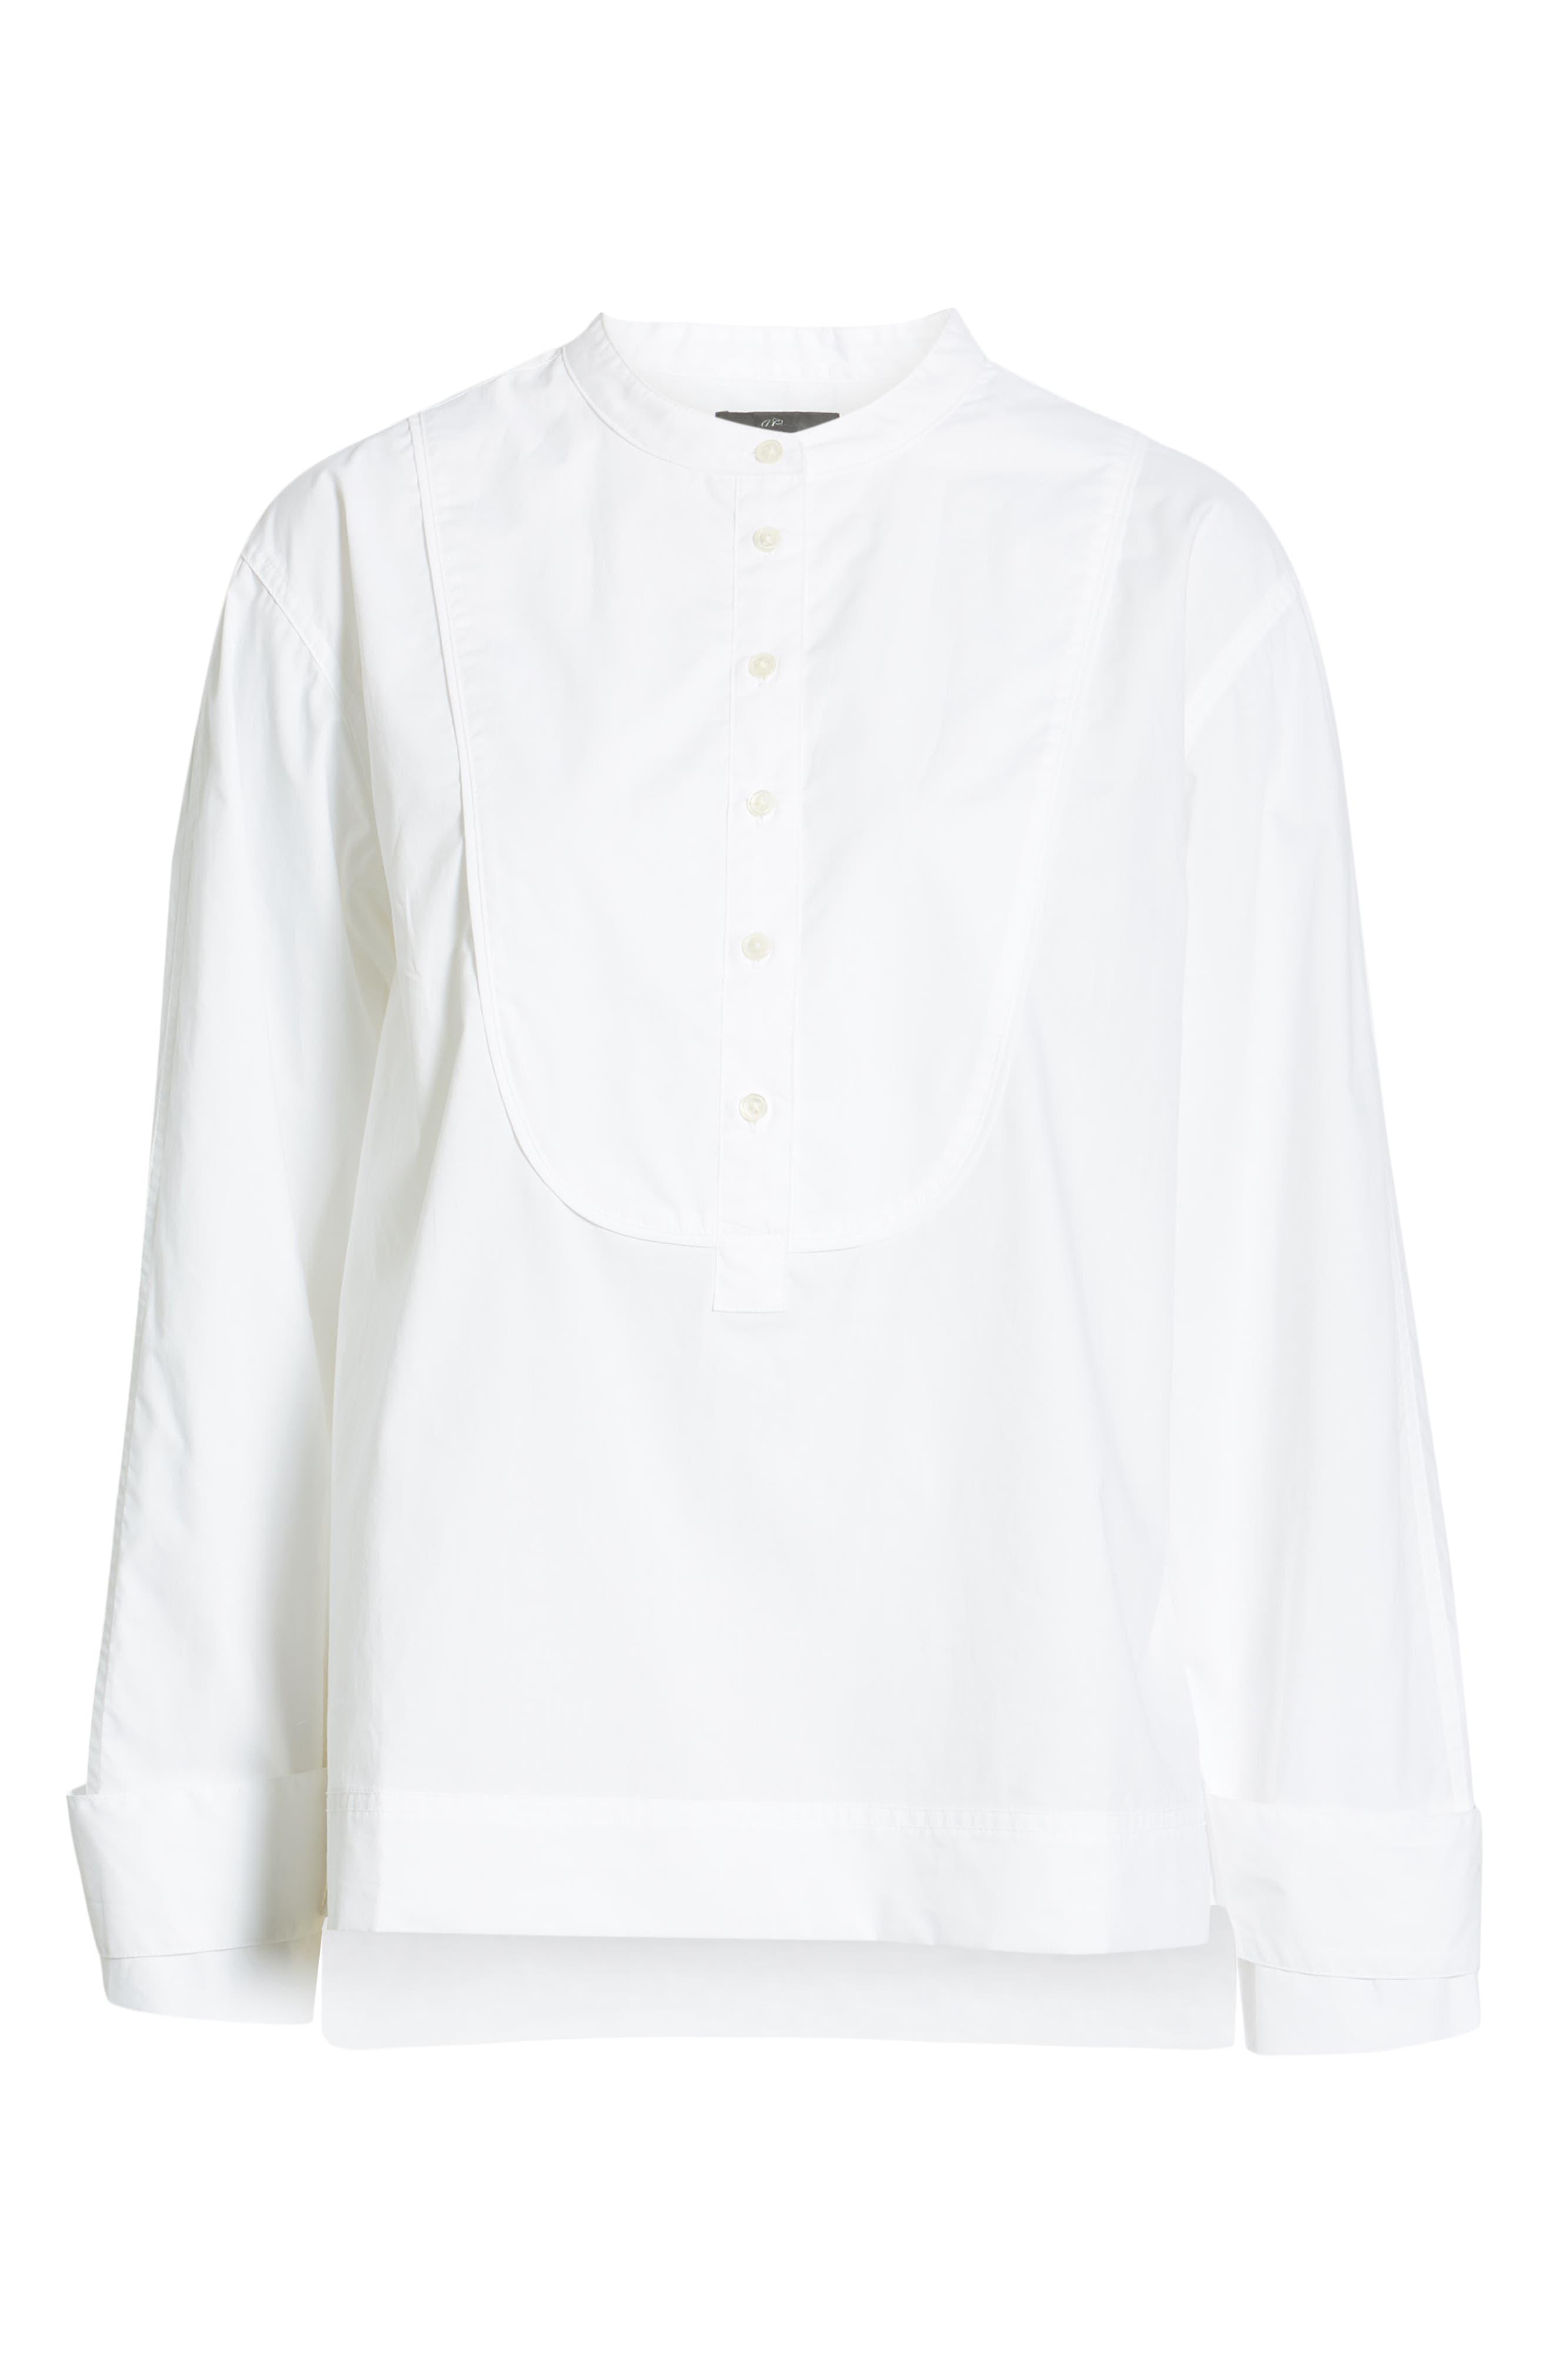 J.CREW, Cotton Tuxedo Popover Top, Alternate thumbnail 6, color, 100